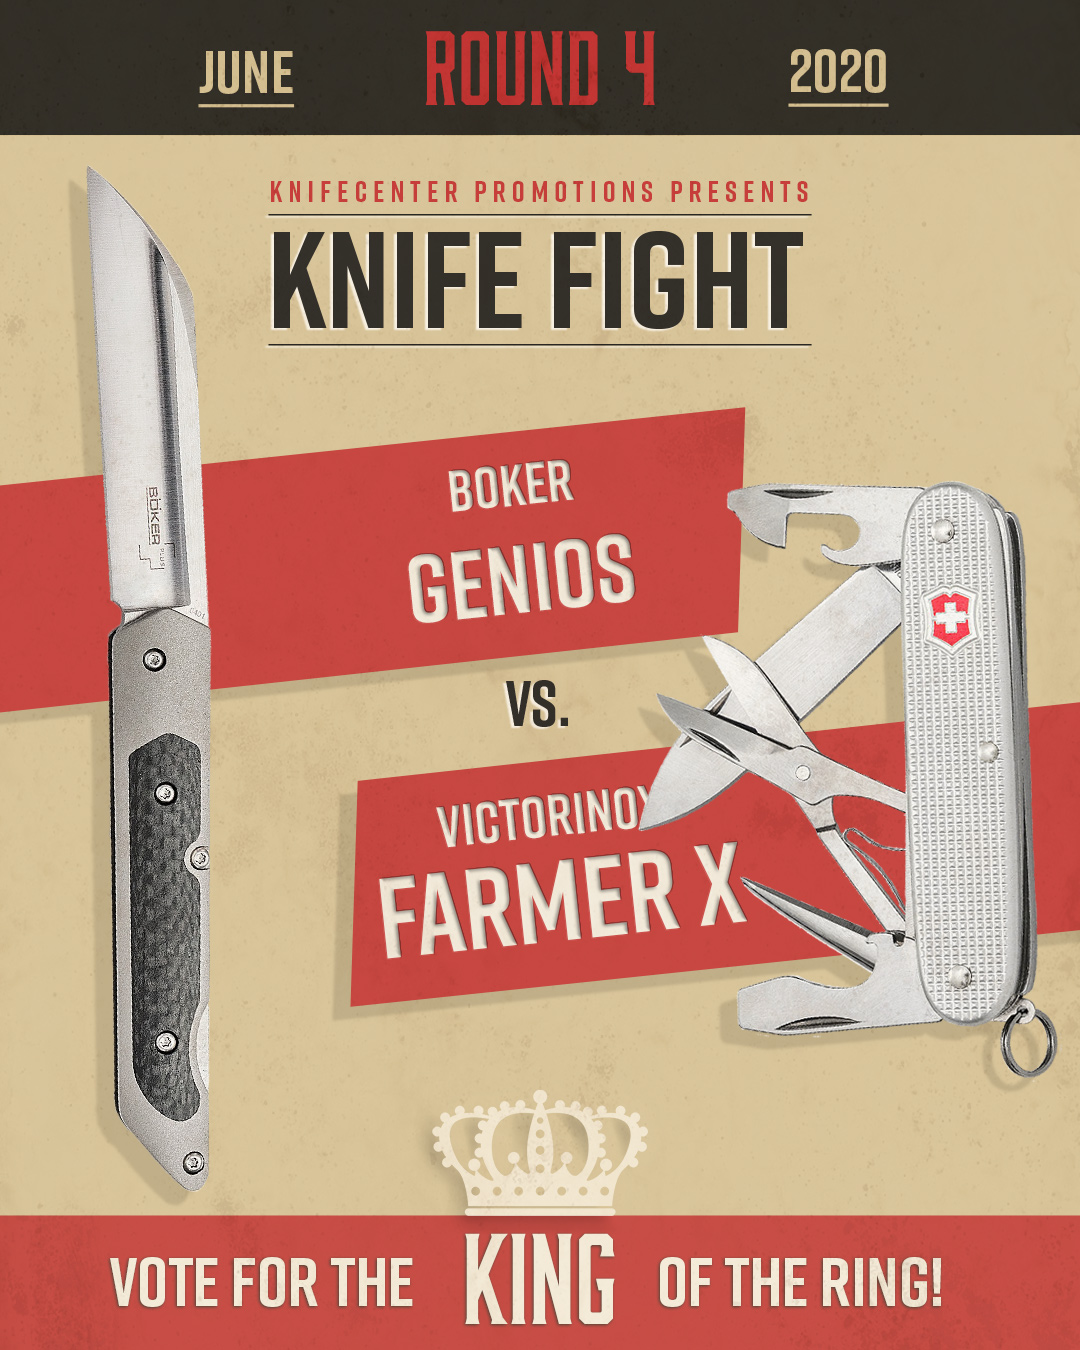 Boker Genios vs. Victorinox Farmer X